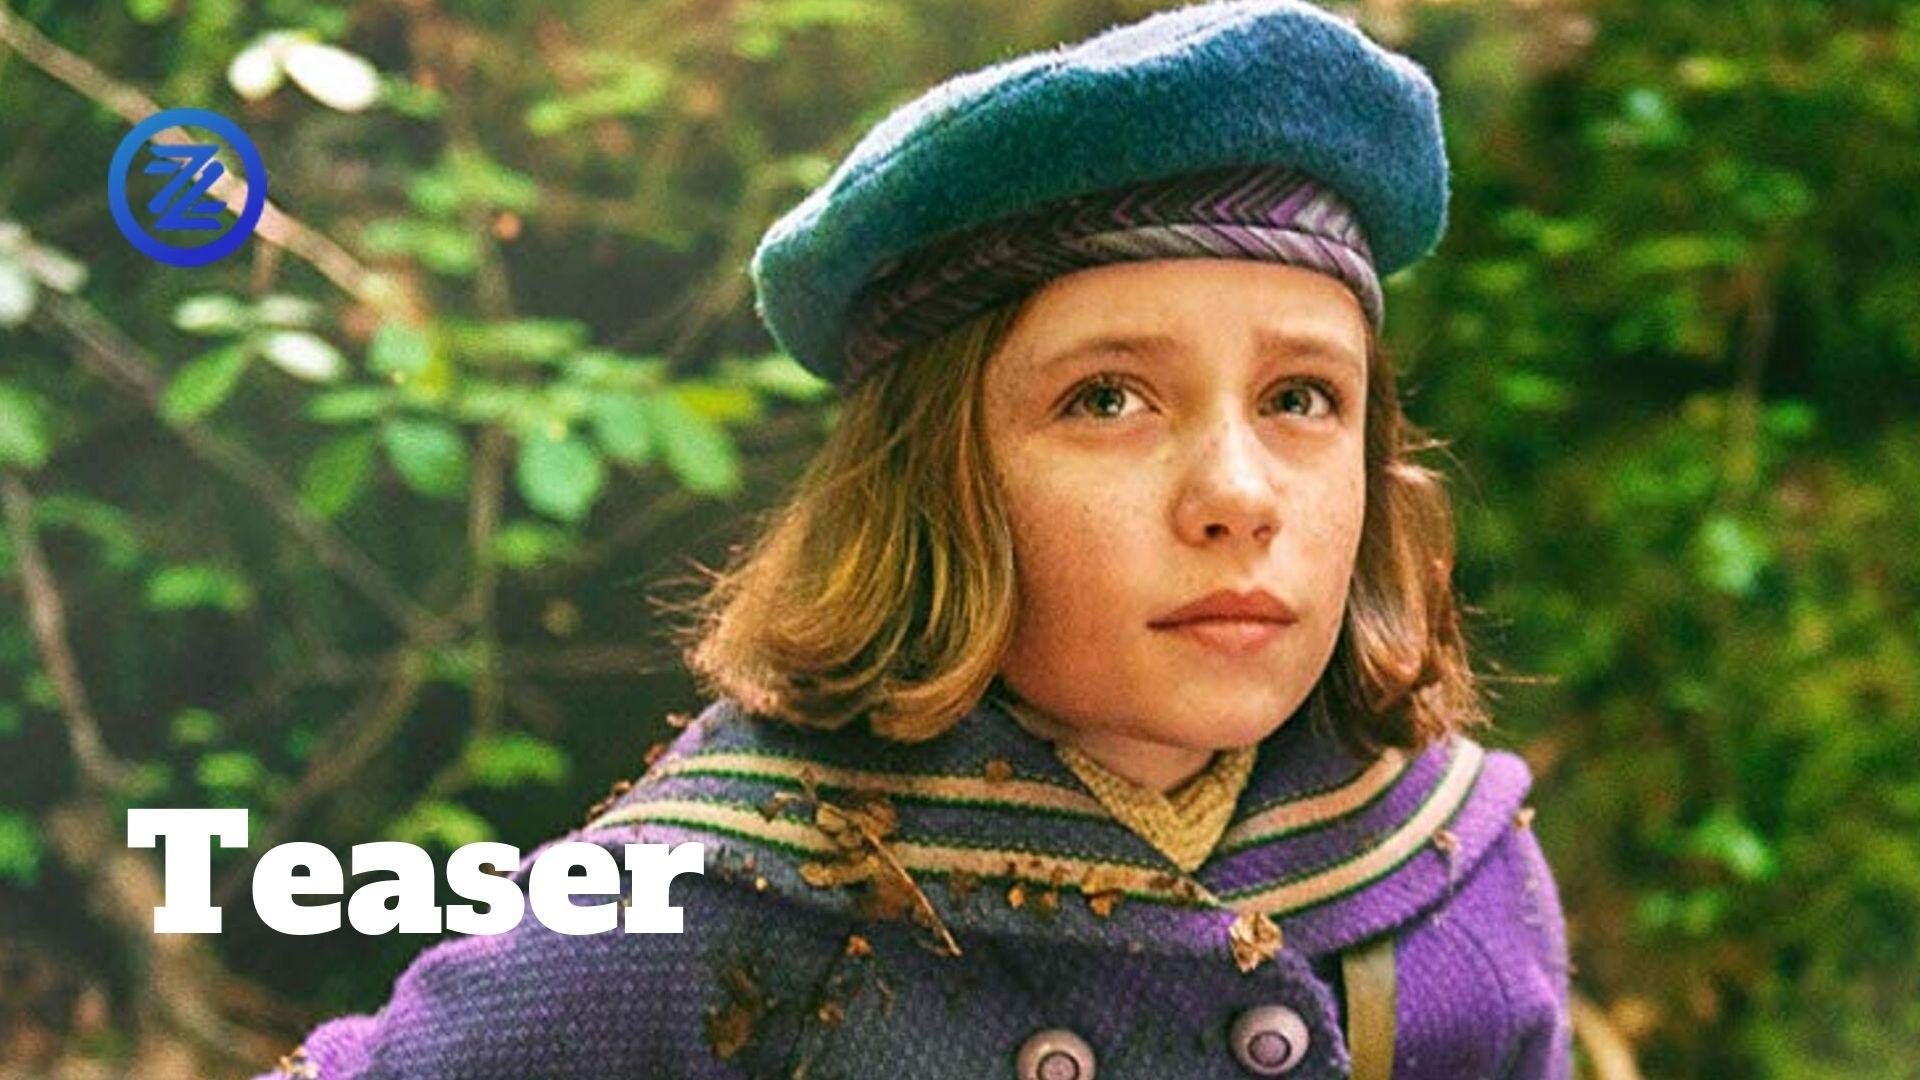 The Secret Garden Teaser Trailer #1 (2020) Dixie Egerickx, Colin Firth Drama Movie HD